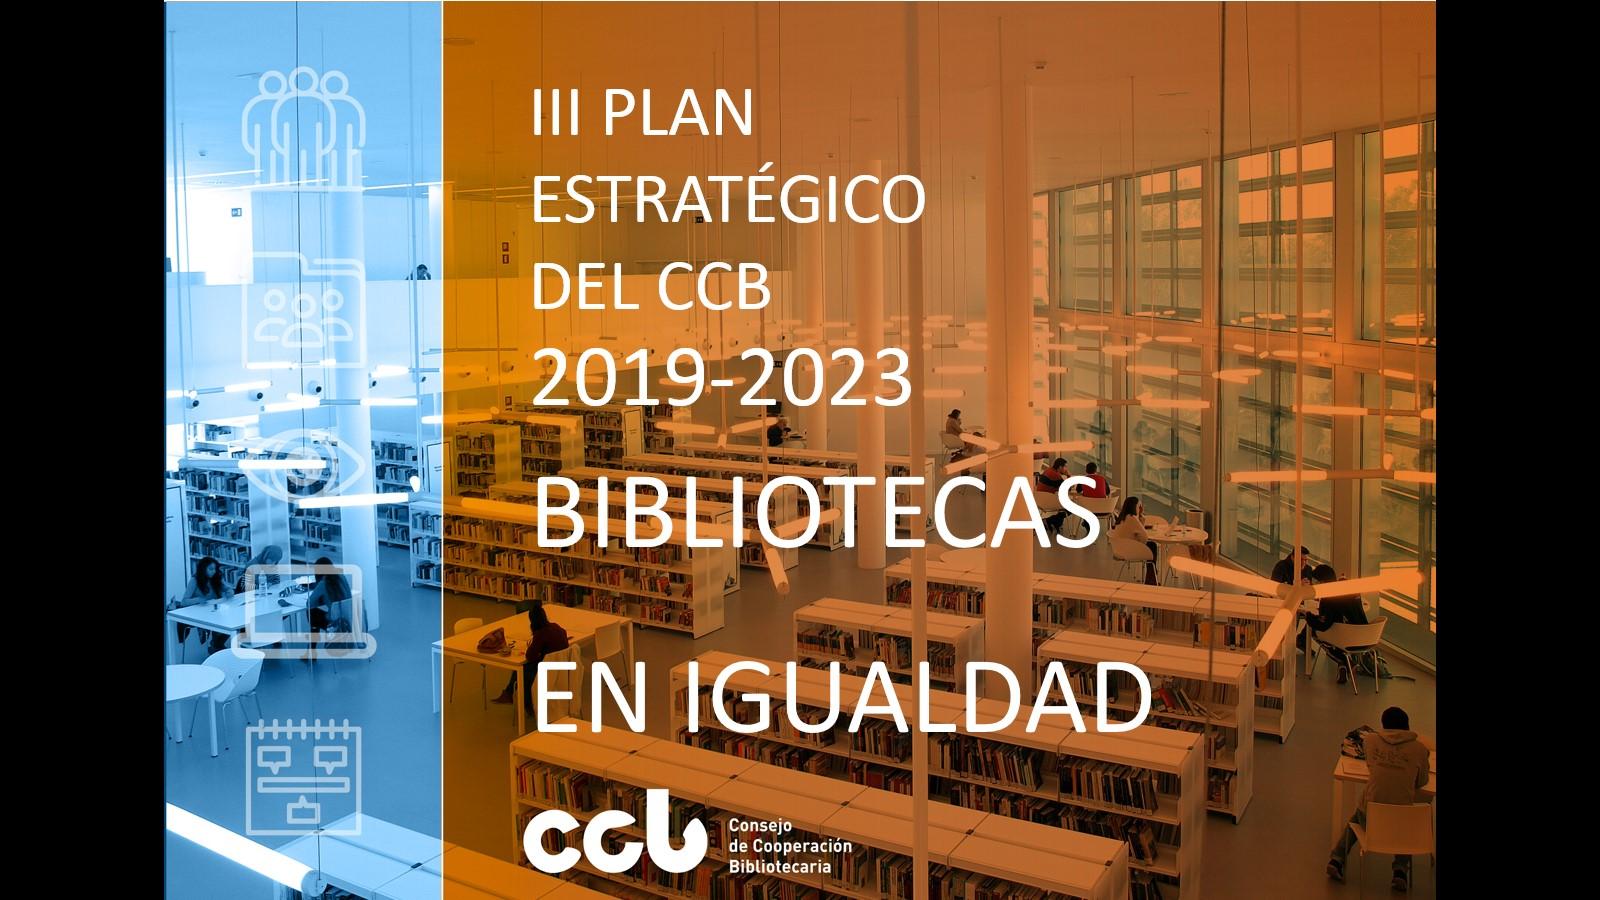 III Plan Estratégico 2019-2023